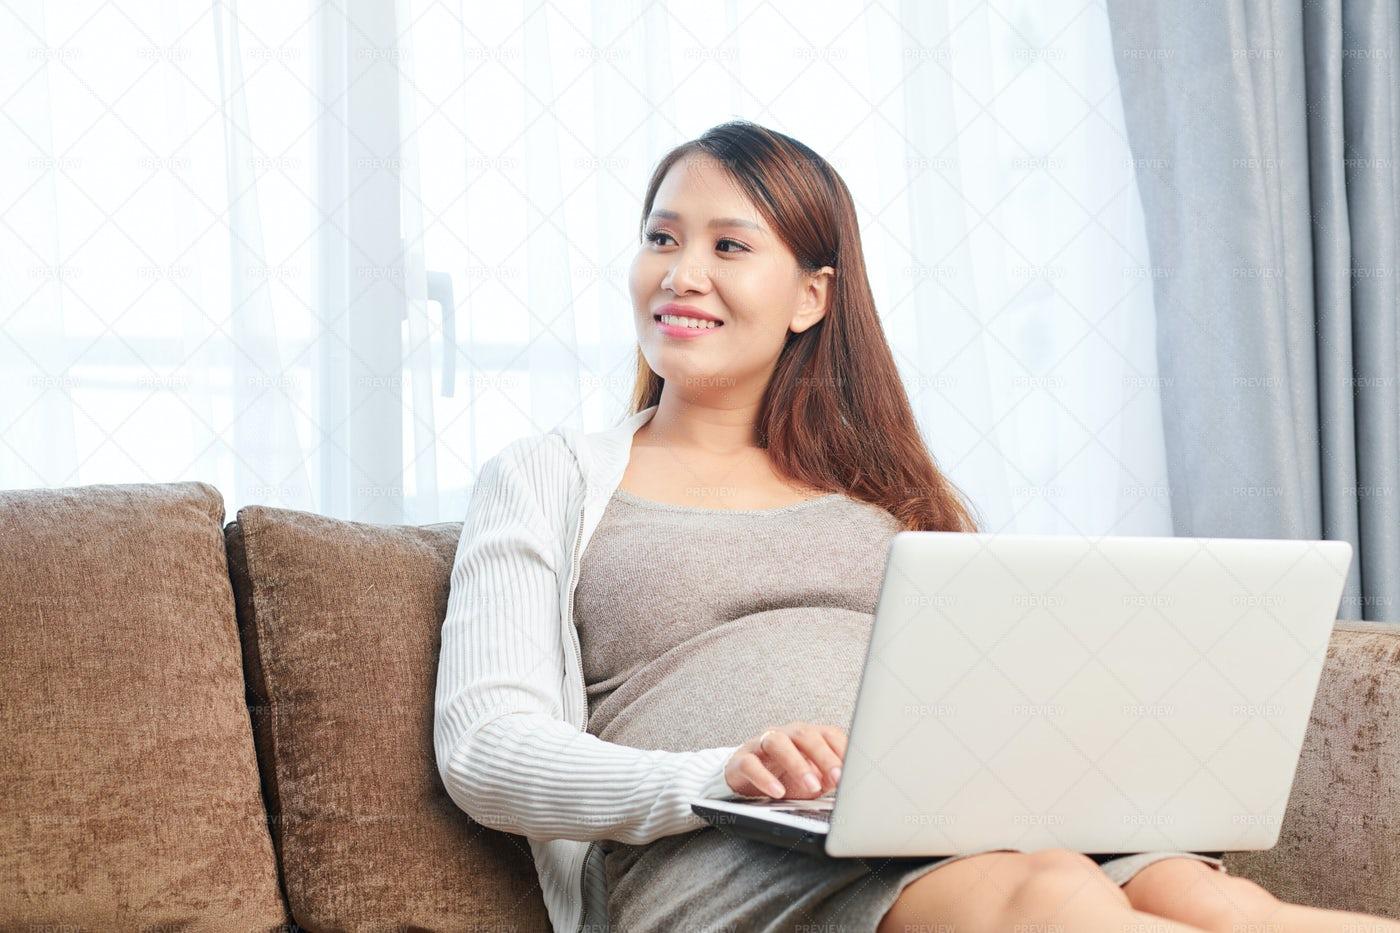 Pregnant Woman Working On Laptop: Stock Photos